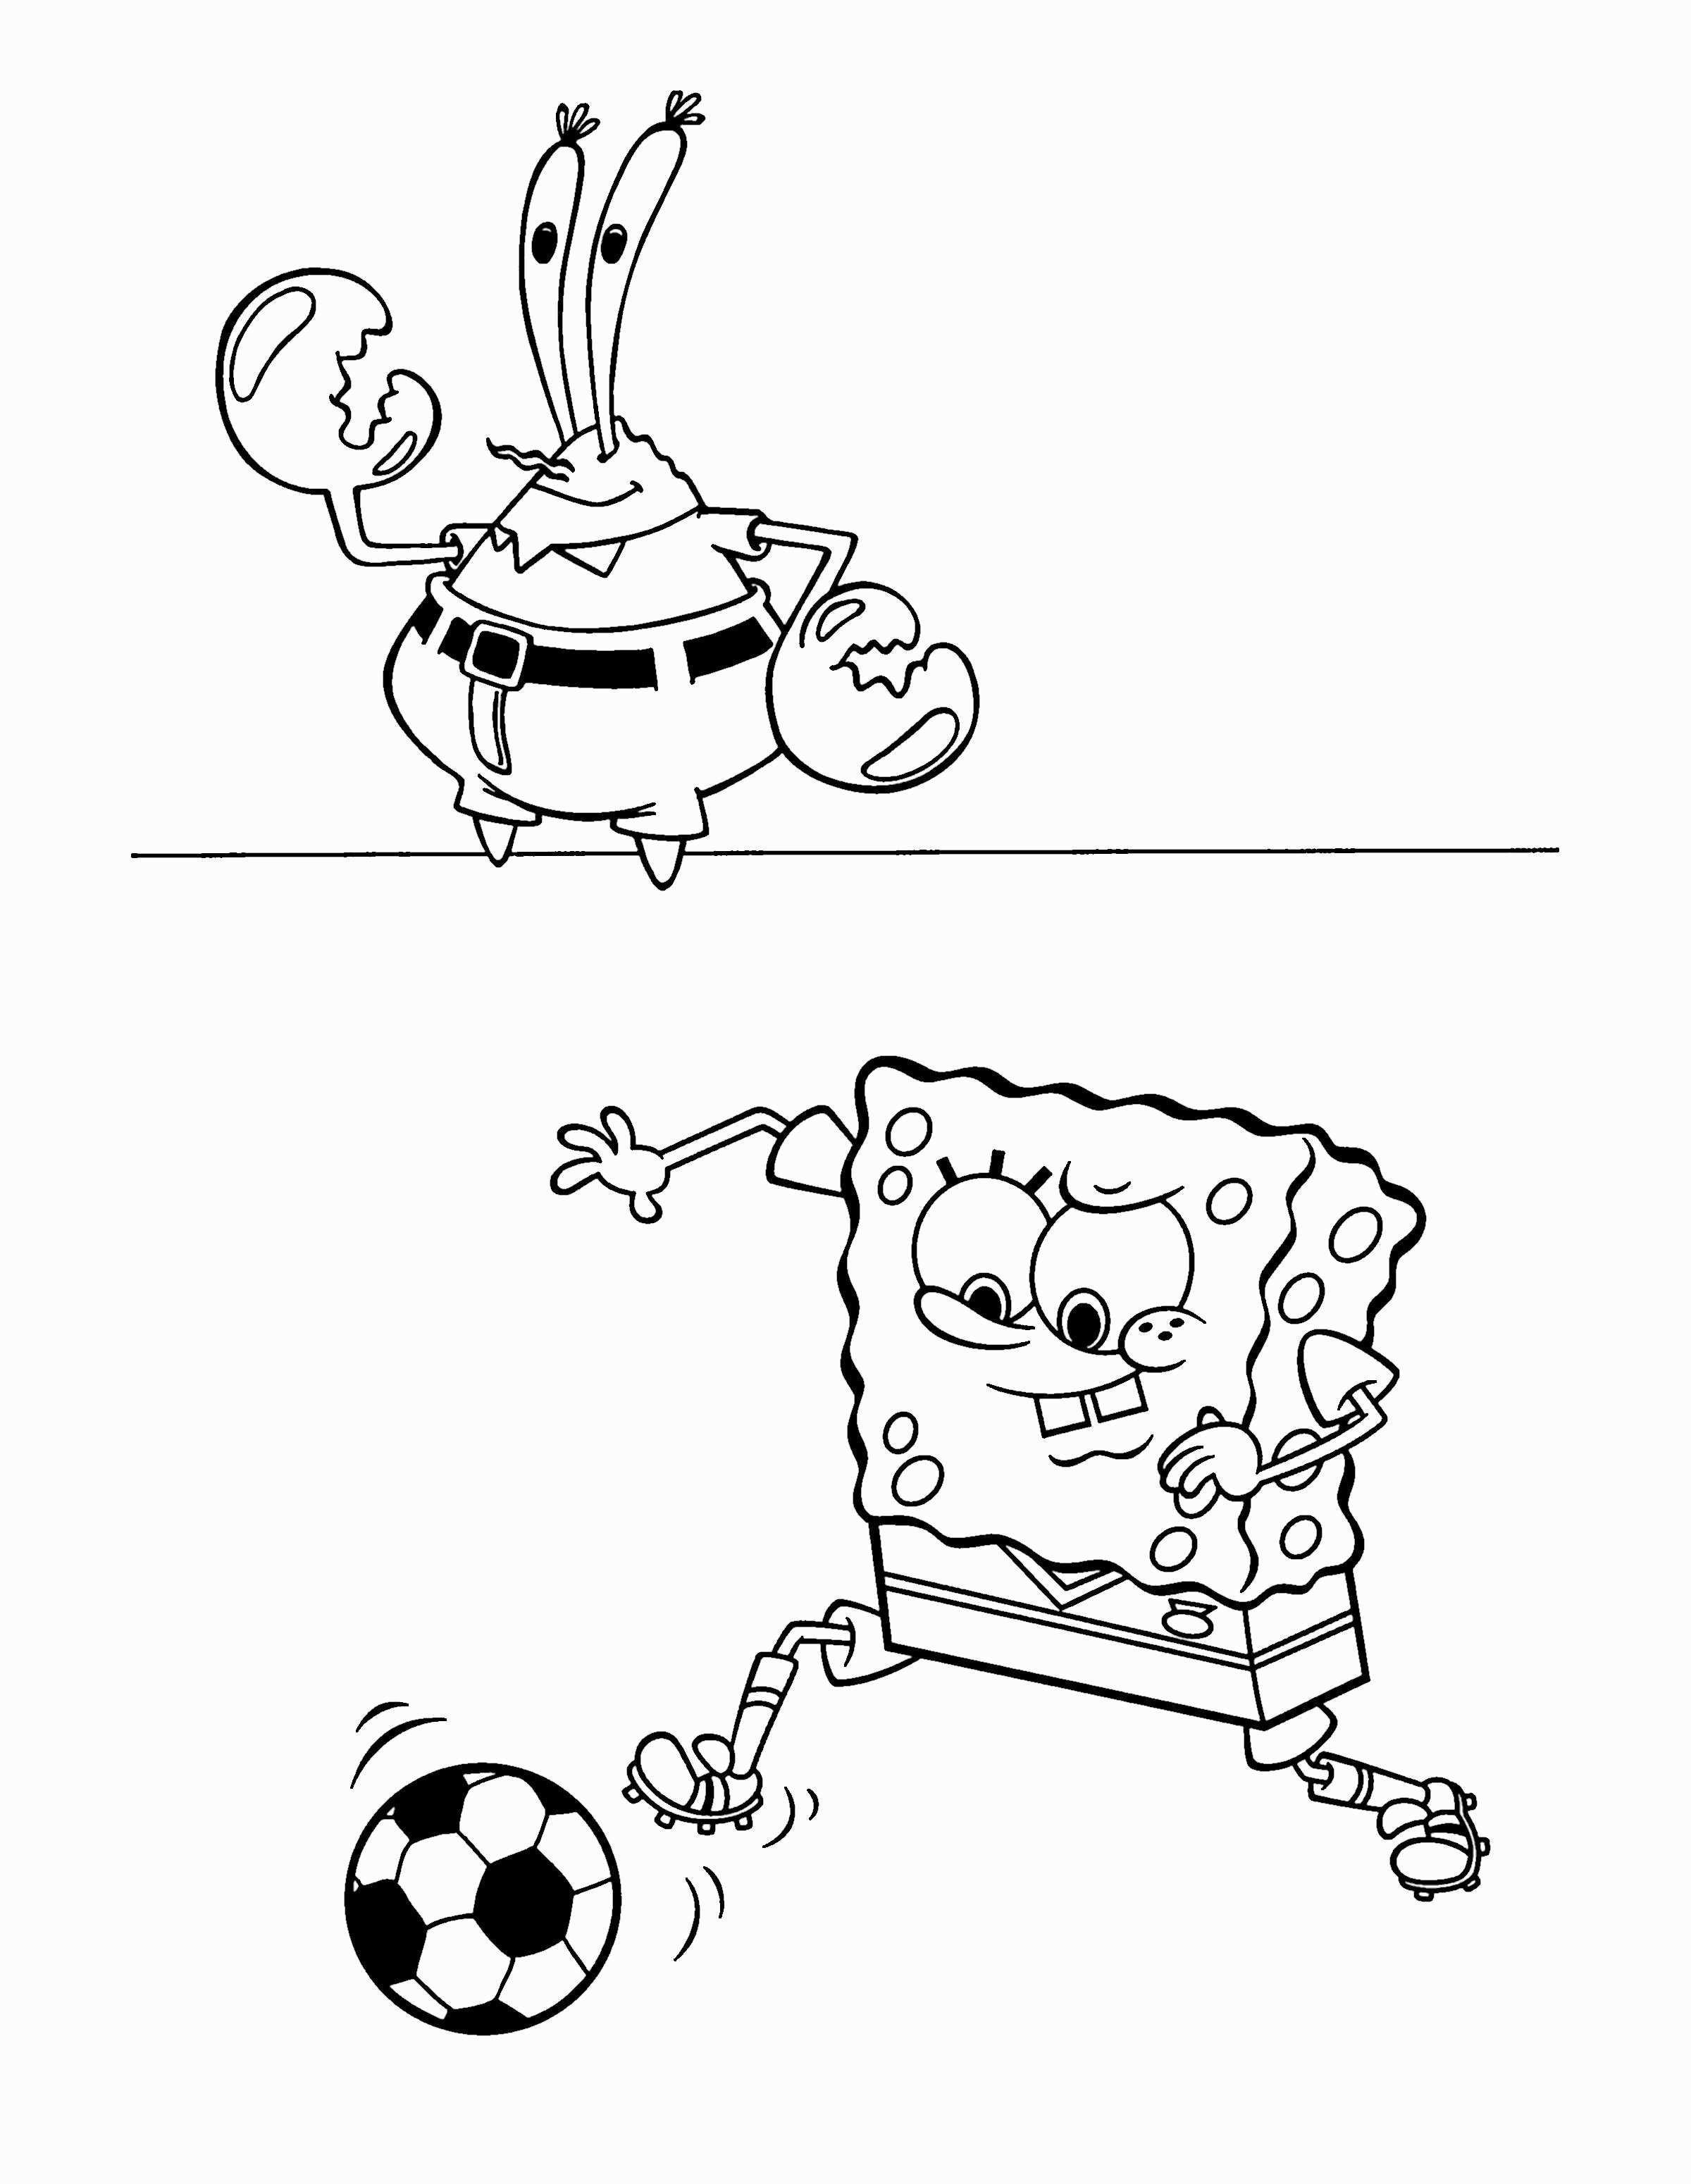 Spongebob Zum Ausmalen Genial Coloring Pages Spongbob Elegant Spongebob Ausmalbilder Inspirierend Fotografieren